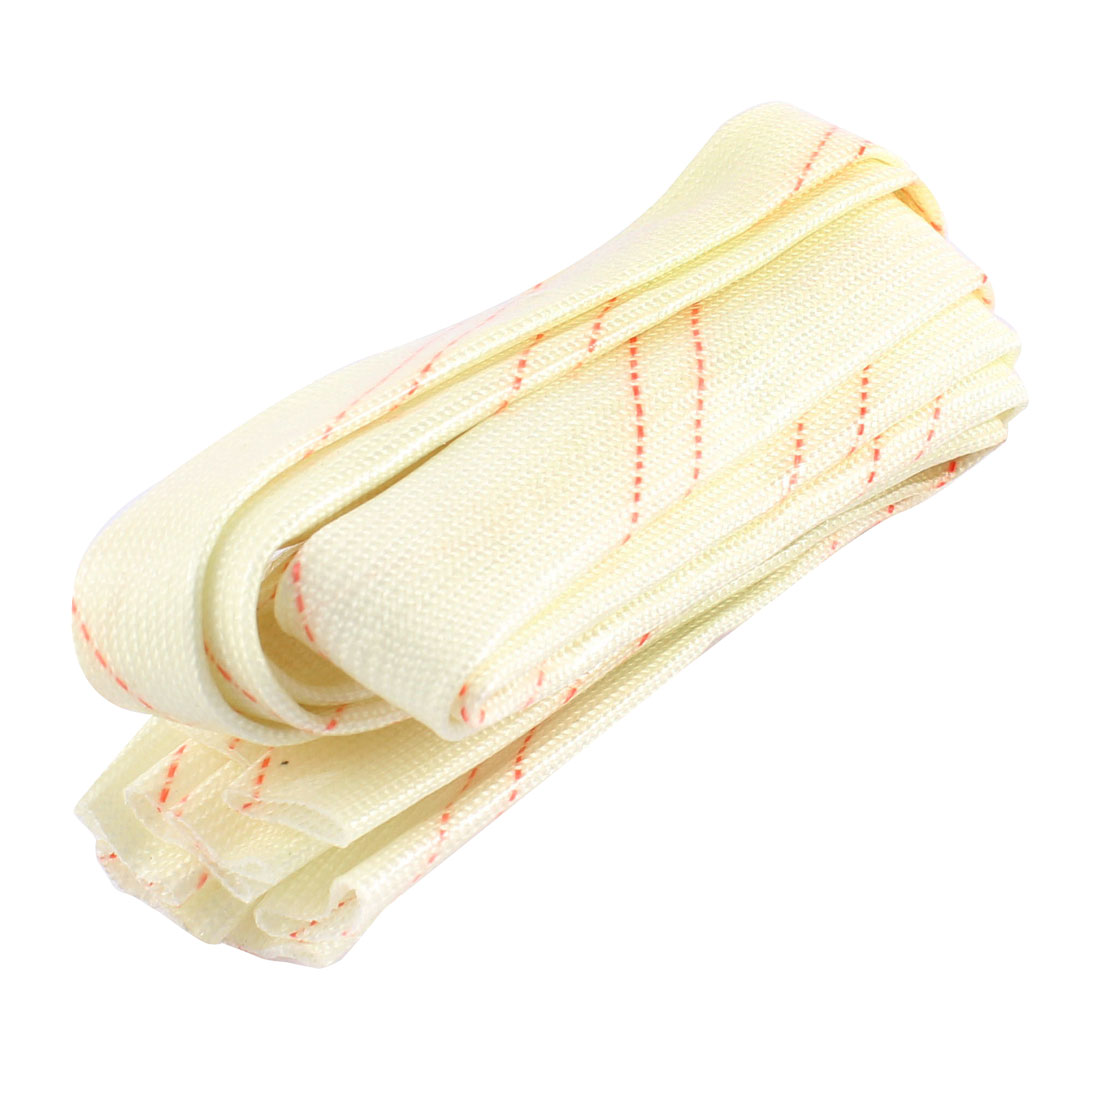 "6pcs 20"" 50cm Length 14mm Dia Fiberglass PVC Insulating Cover Sleeve Tube Sleeving Wrap"